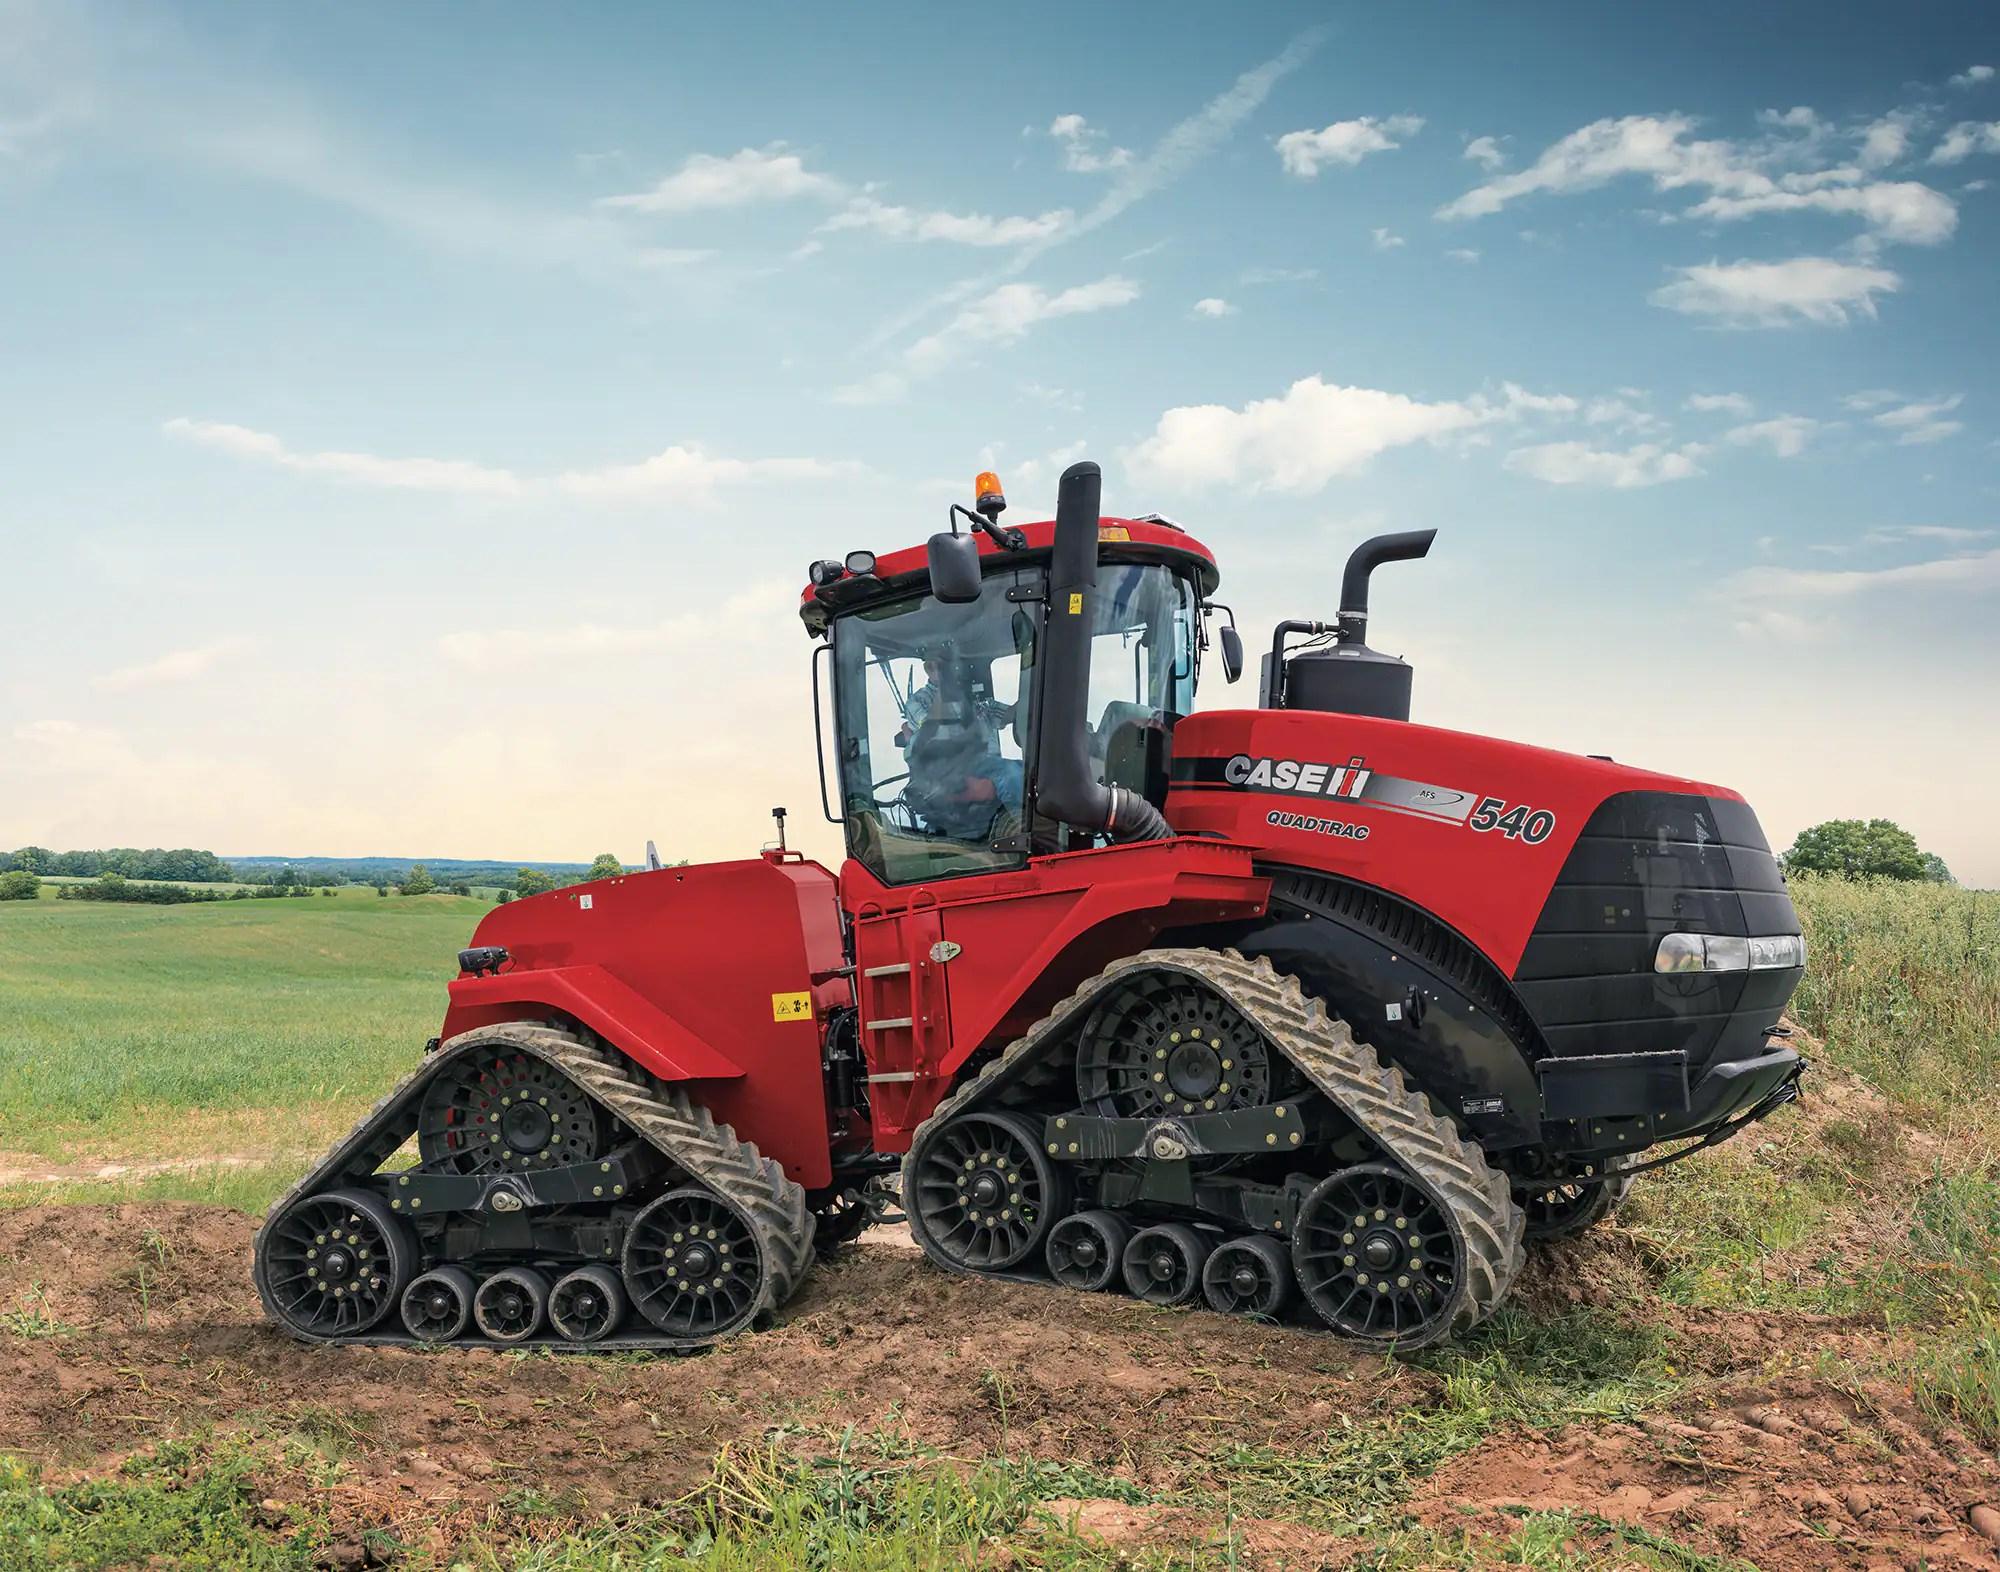 steiger quadtrac 540 0713 mim 0576 width 1280 height 562 steiger series 4wd row crop farming tractors case [ 2000 x 1572 Pixel ]